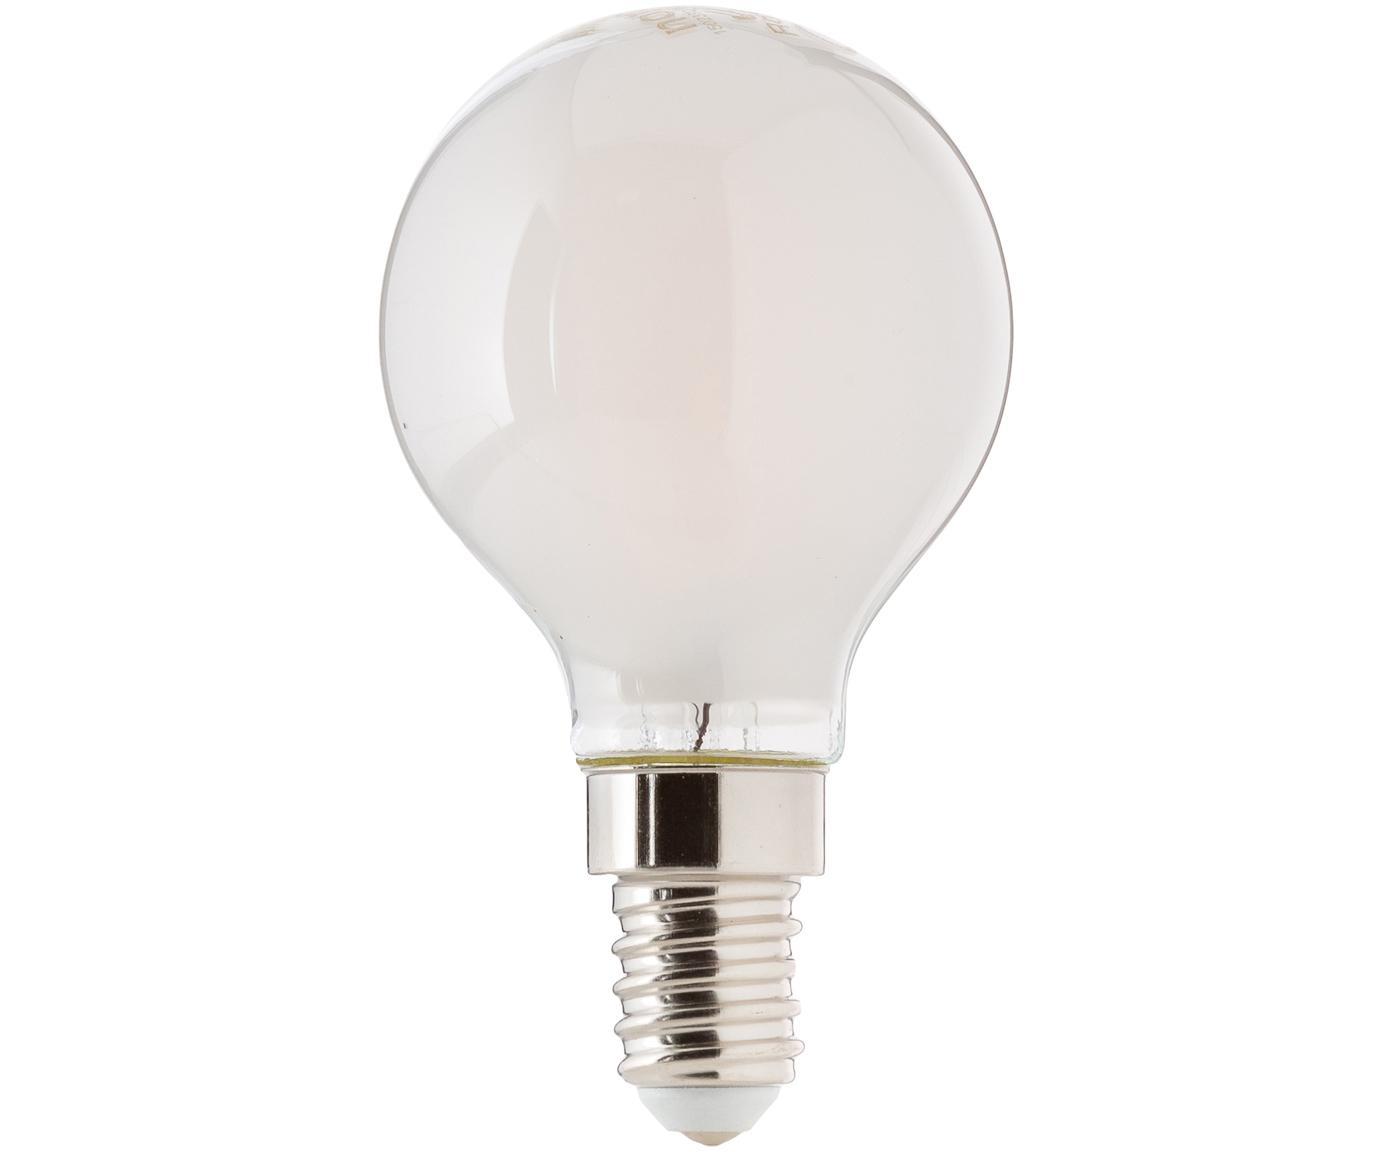 Lampadina Sedim (E14 / 2Watt) 5 pz., Paralume: materiale sintetico, Base lampadina: alluminio, Bianco, Ø 5 x Alt. 8 cm